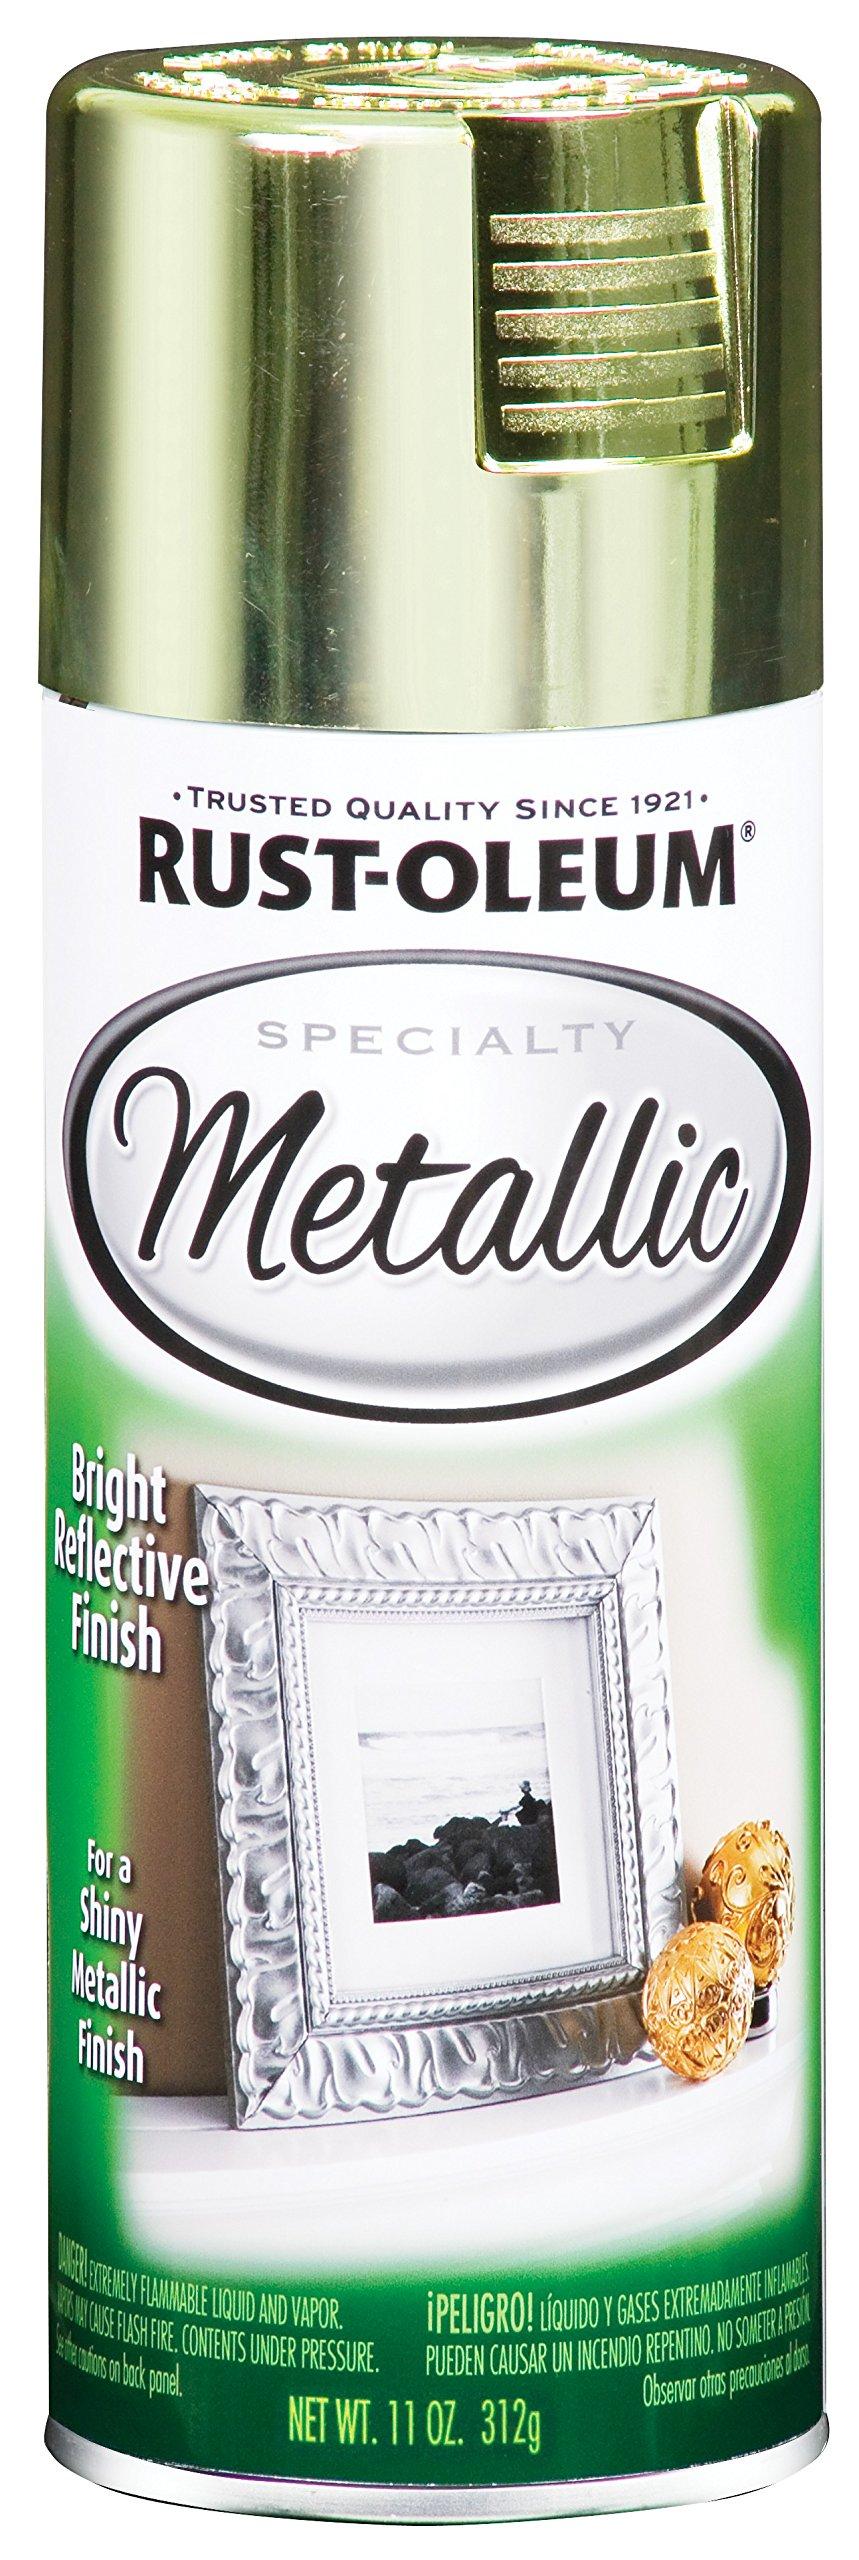 Rust-Oleum 1936830 Specialty Topcoat Metallic Spray Paint, 11 Oz Aerosol Can, 10-12 Sq-Ft, Each, Brass